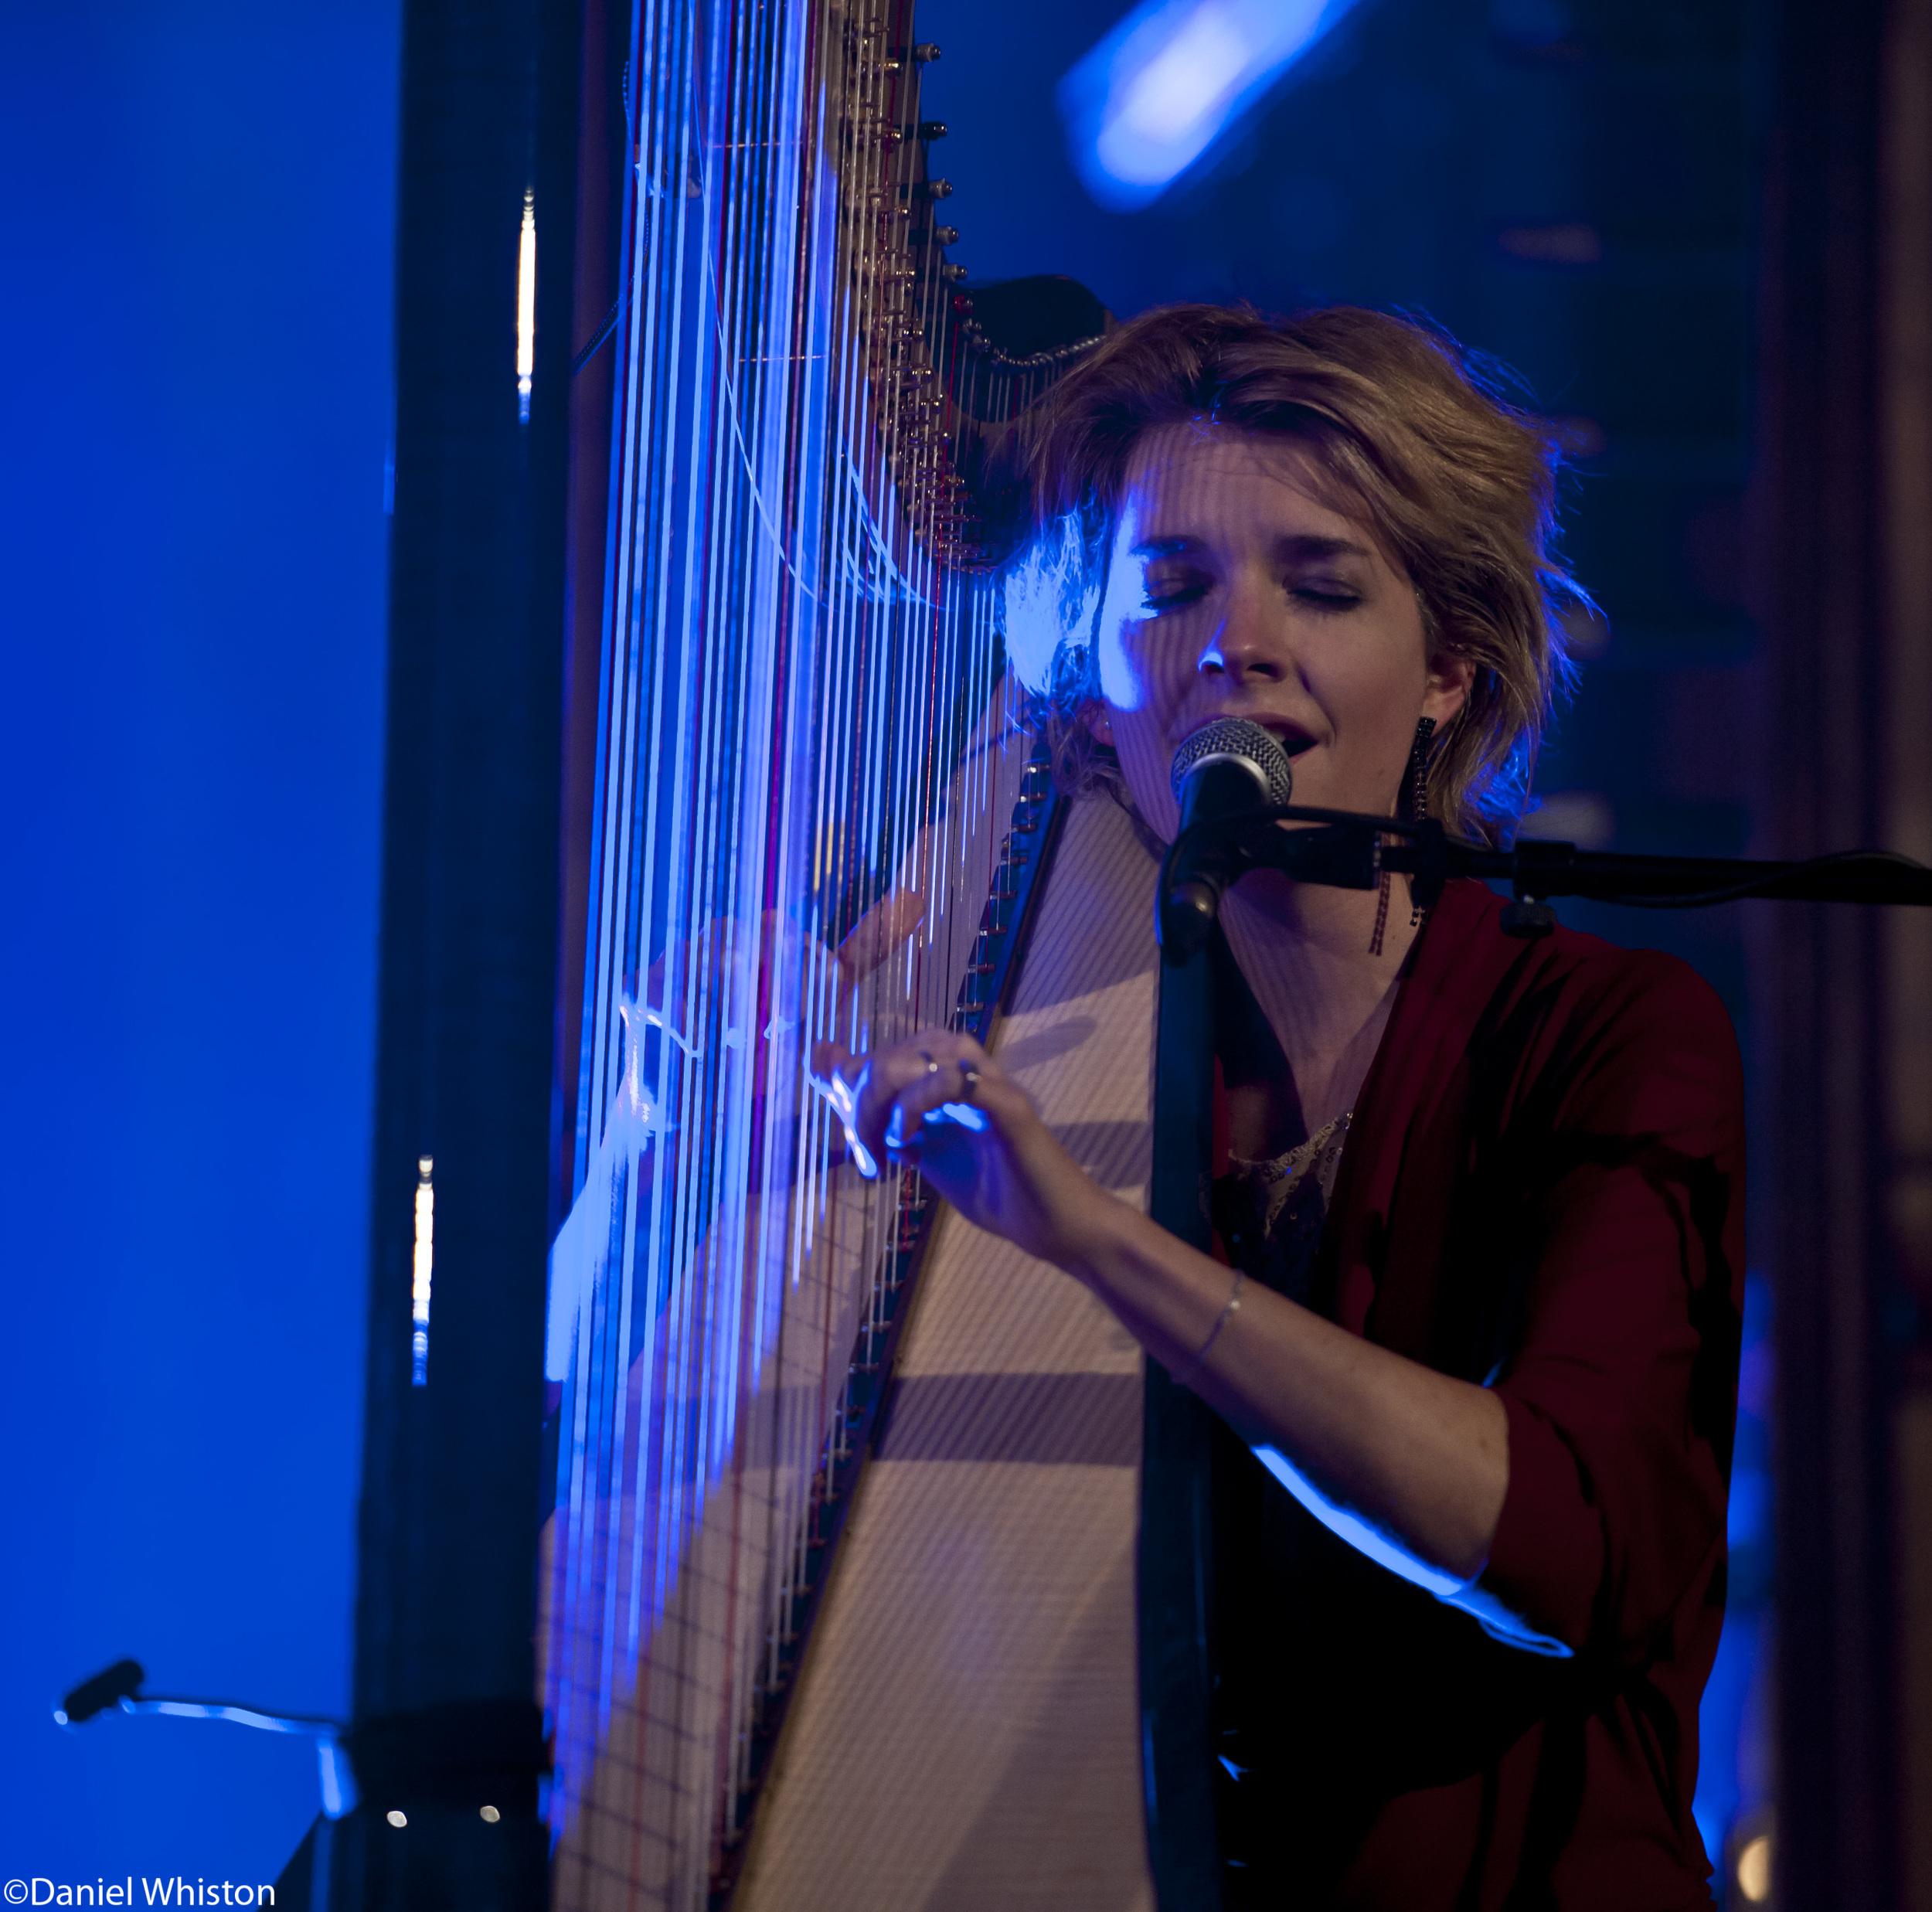 Catrin Finch singing